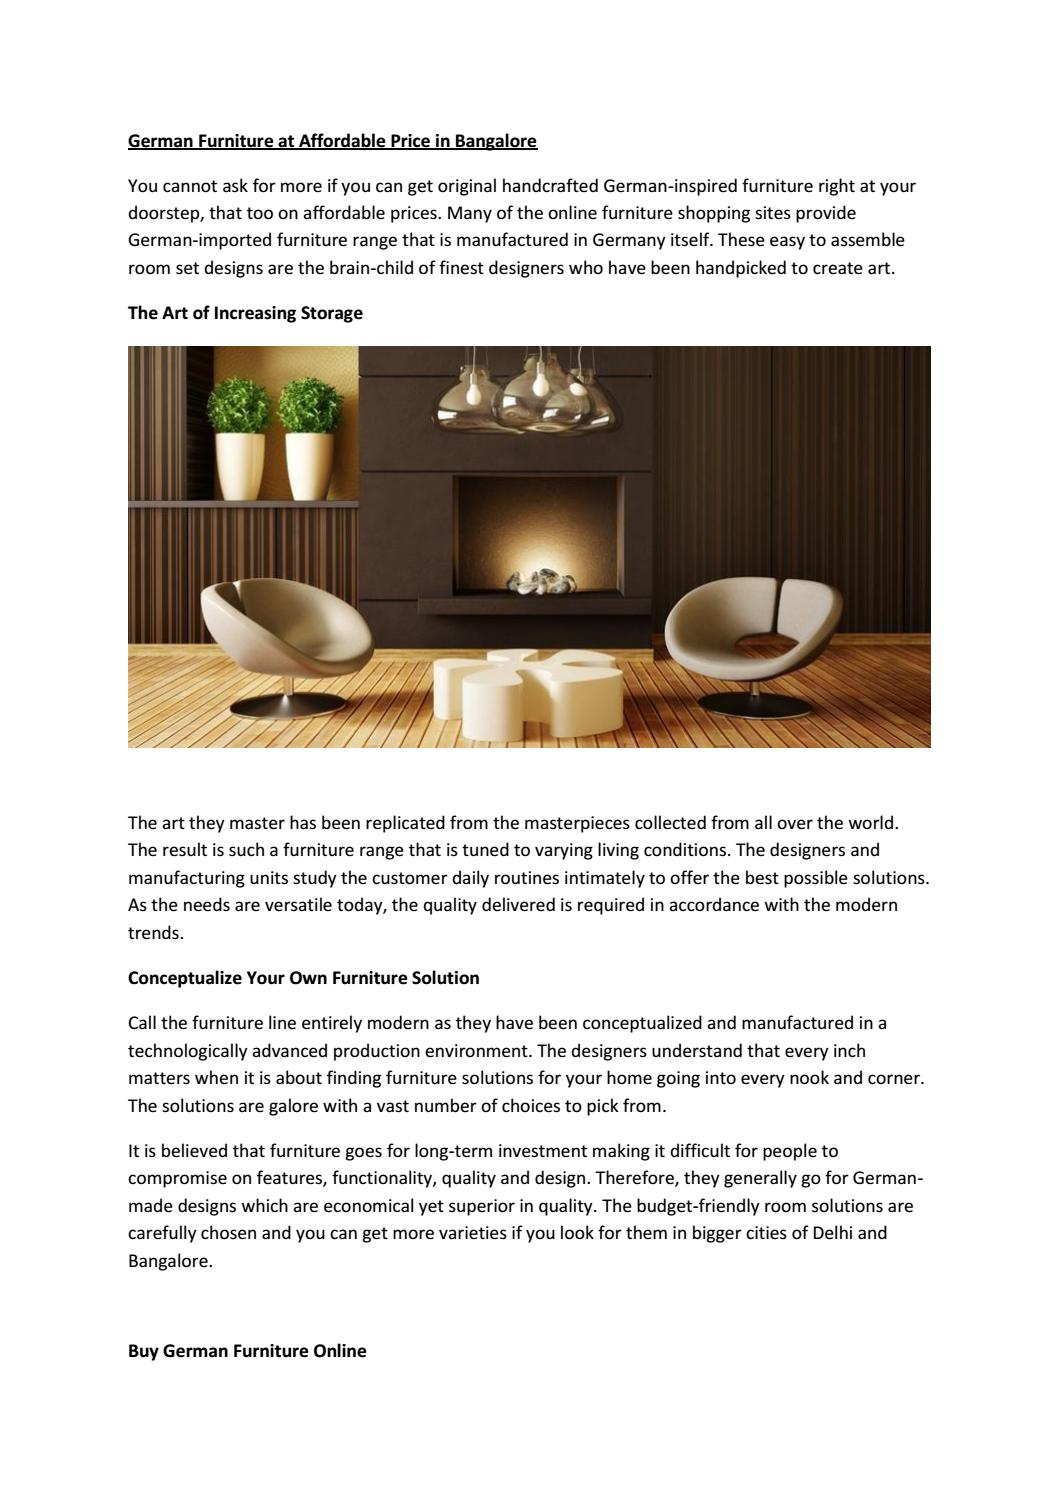 German Furniture At Affordable Price In Bangalore By Kumar Vashudev